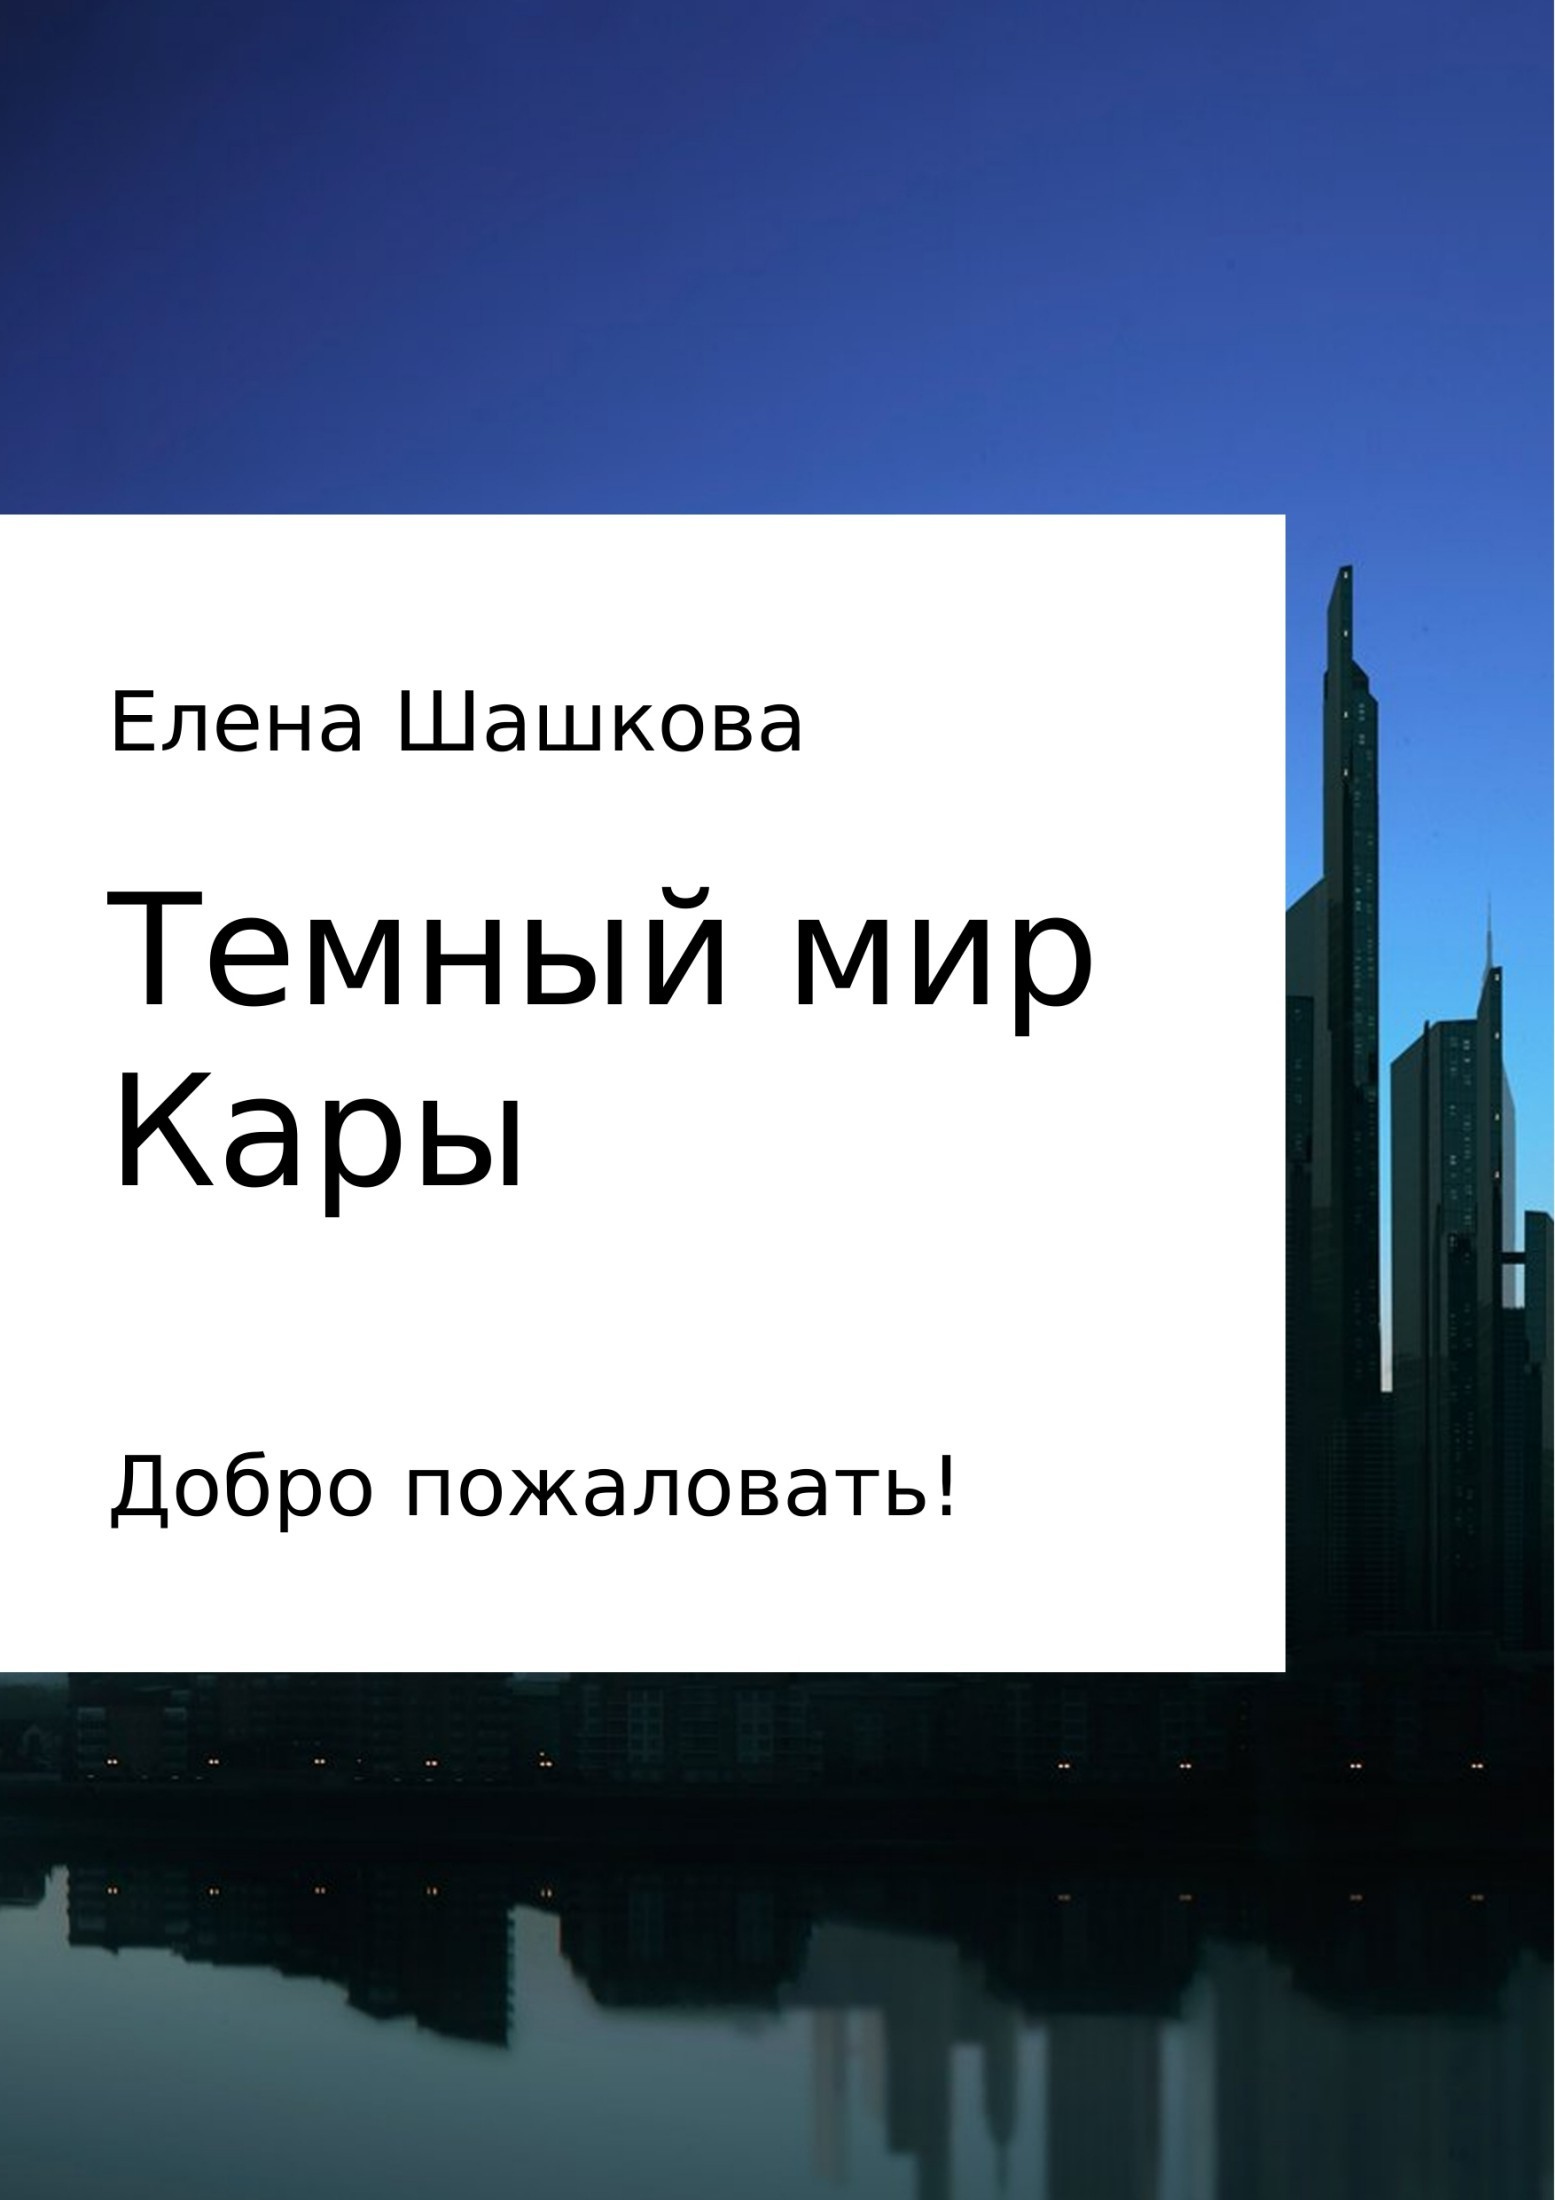 Елена Александровна Шашкова Темный мир Кары